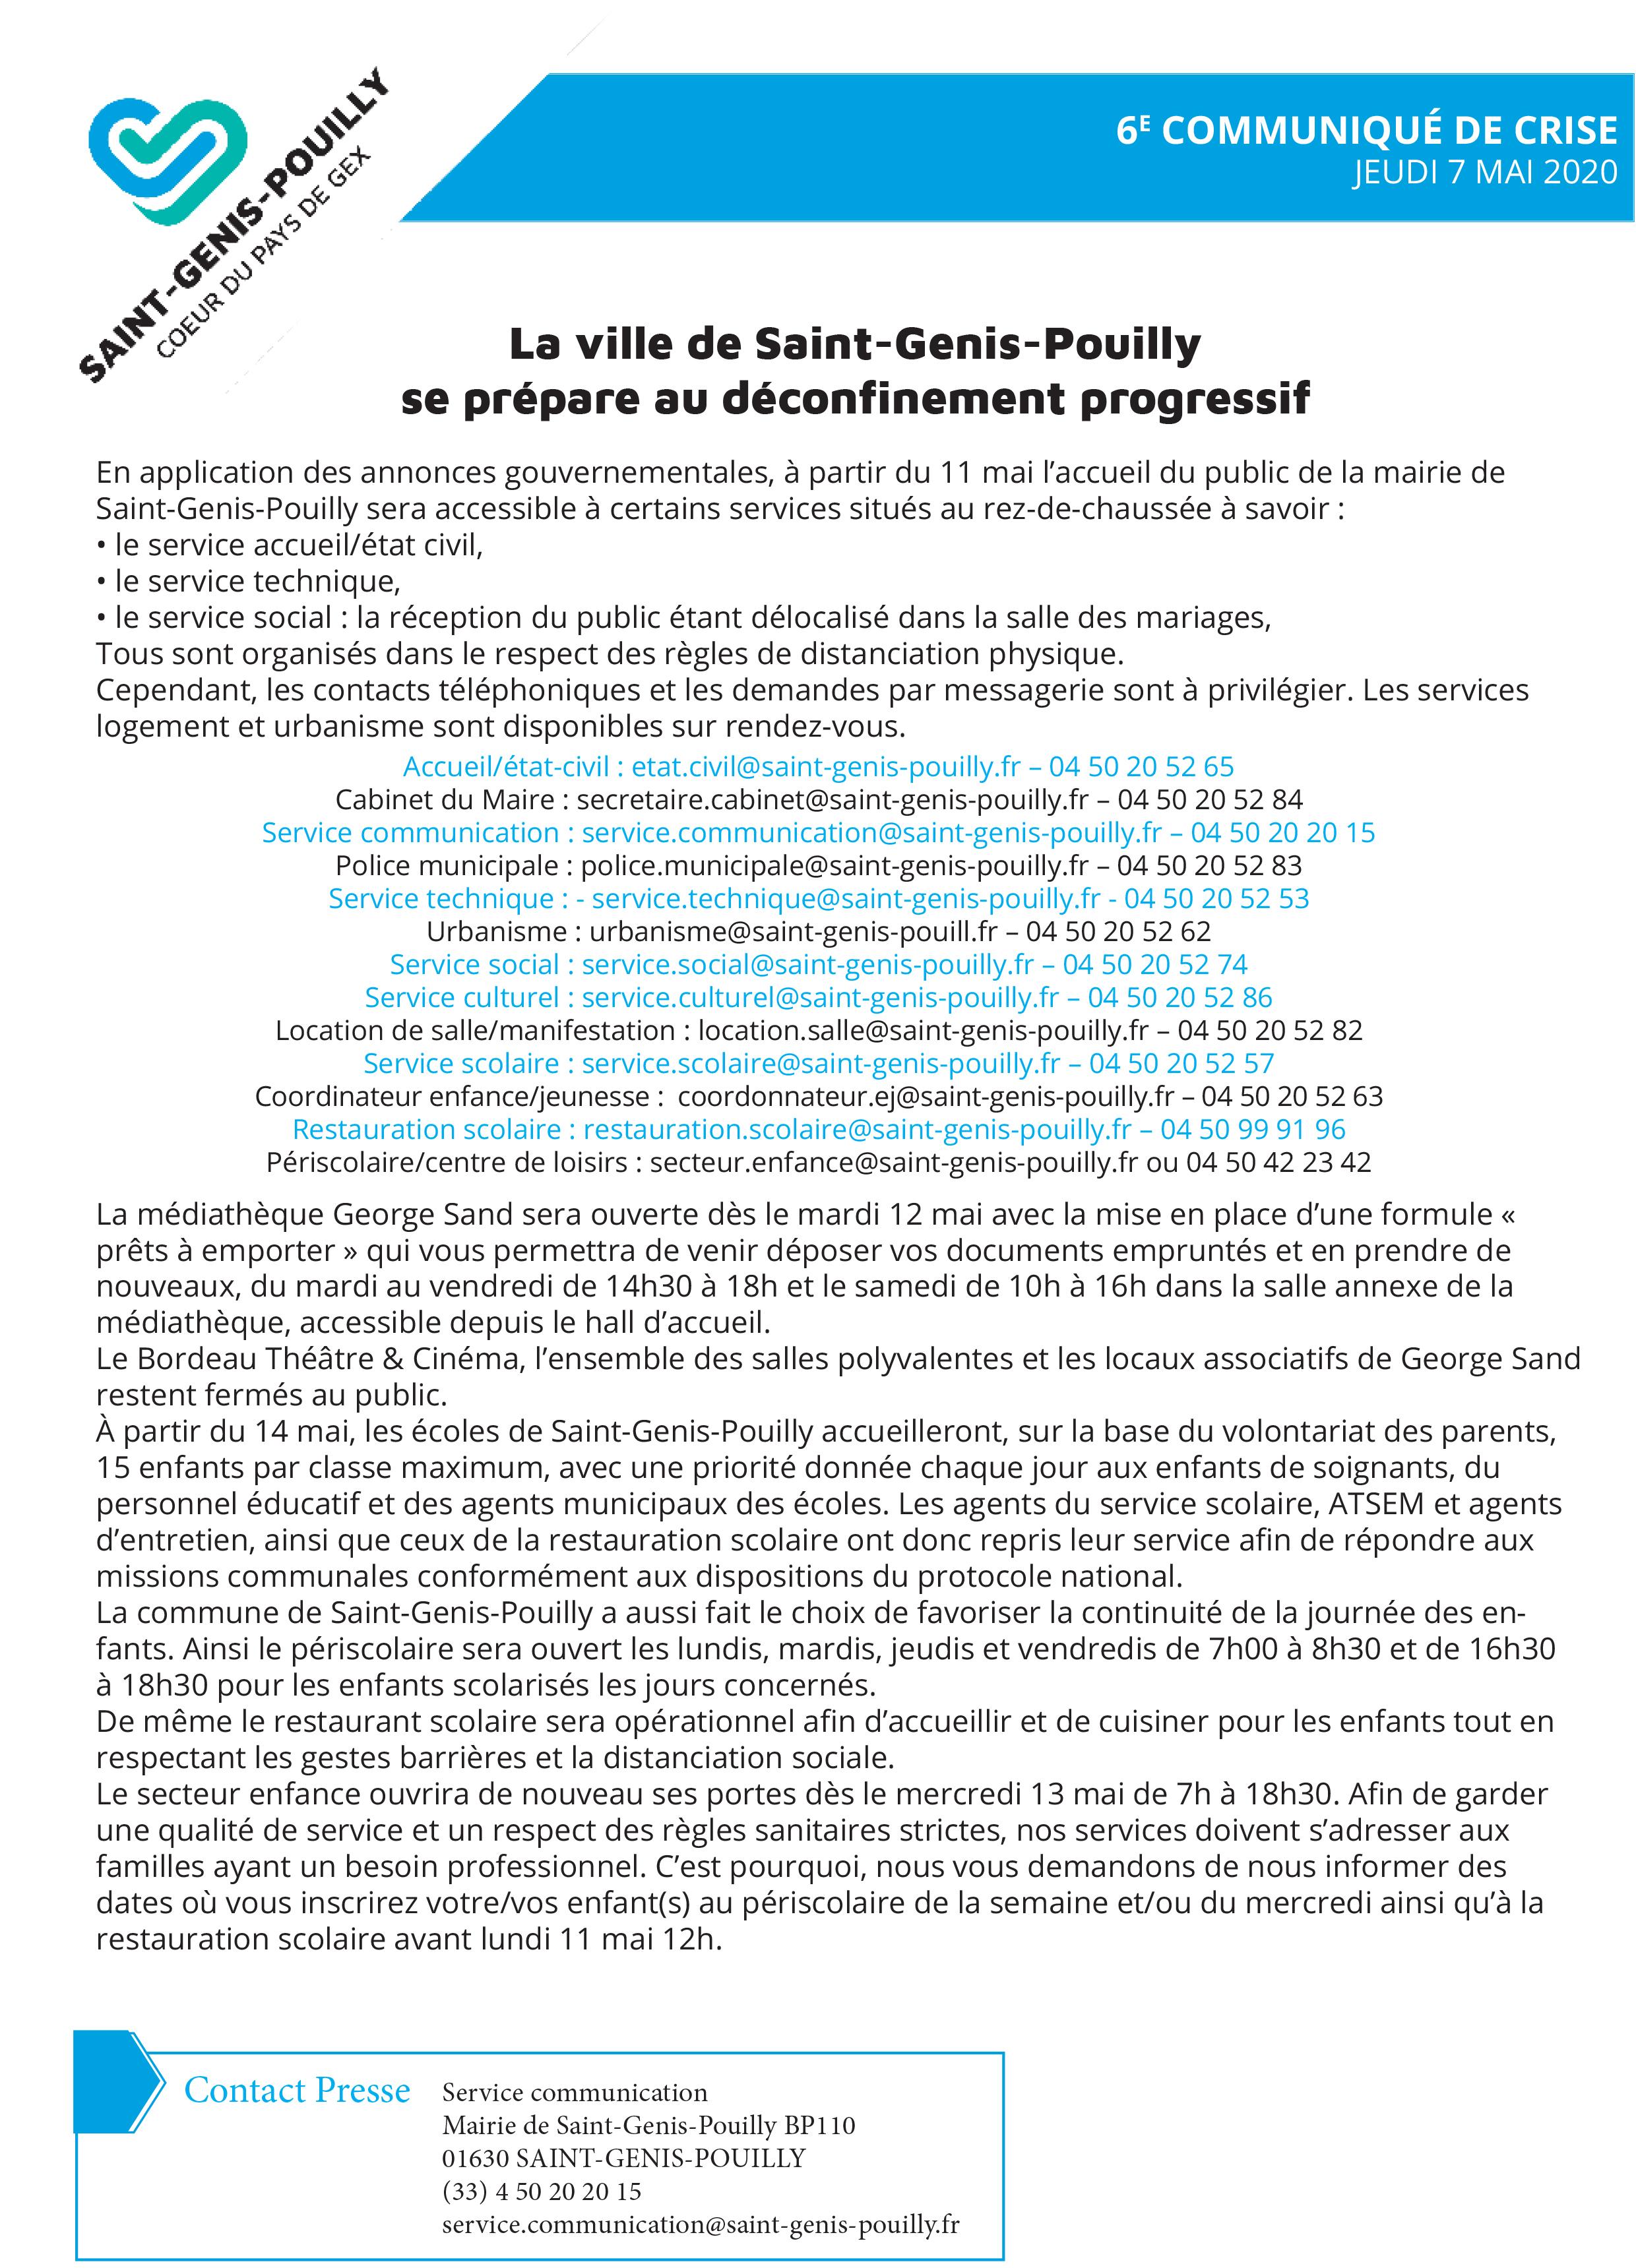 200507_6e_communique_de_presse_copie.jpg